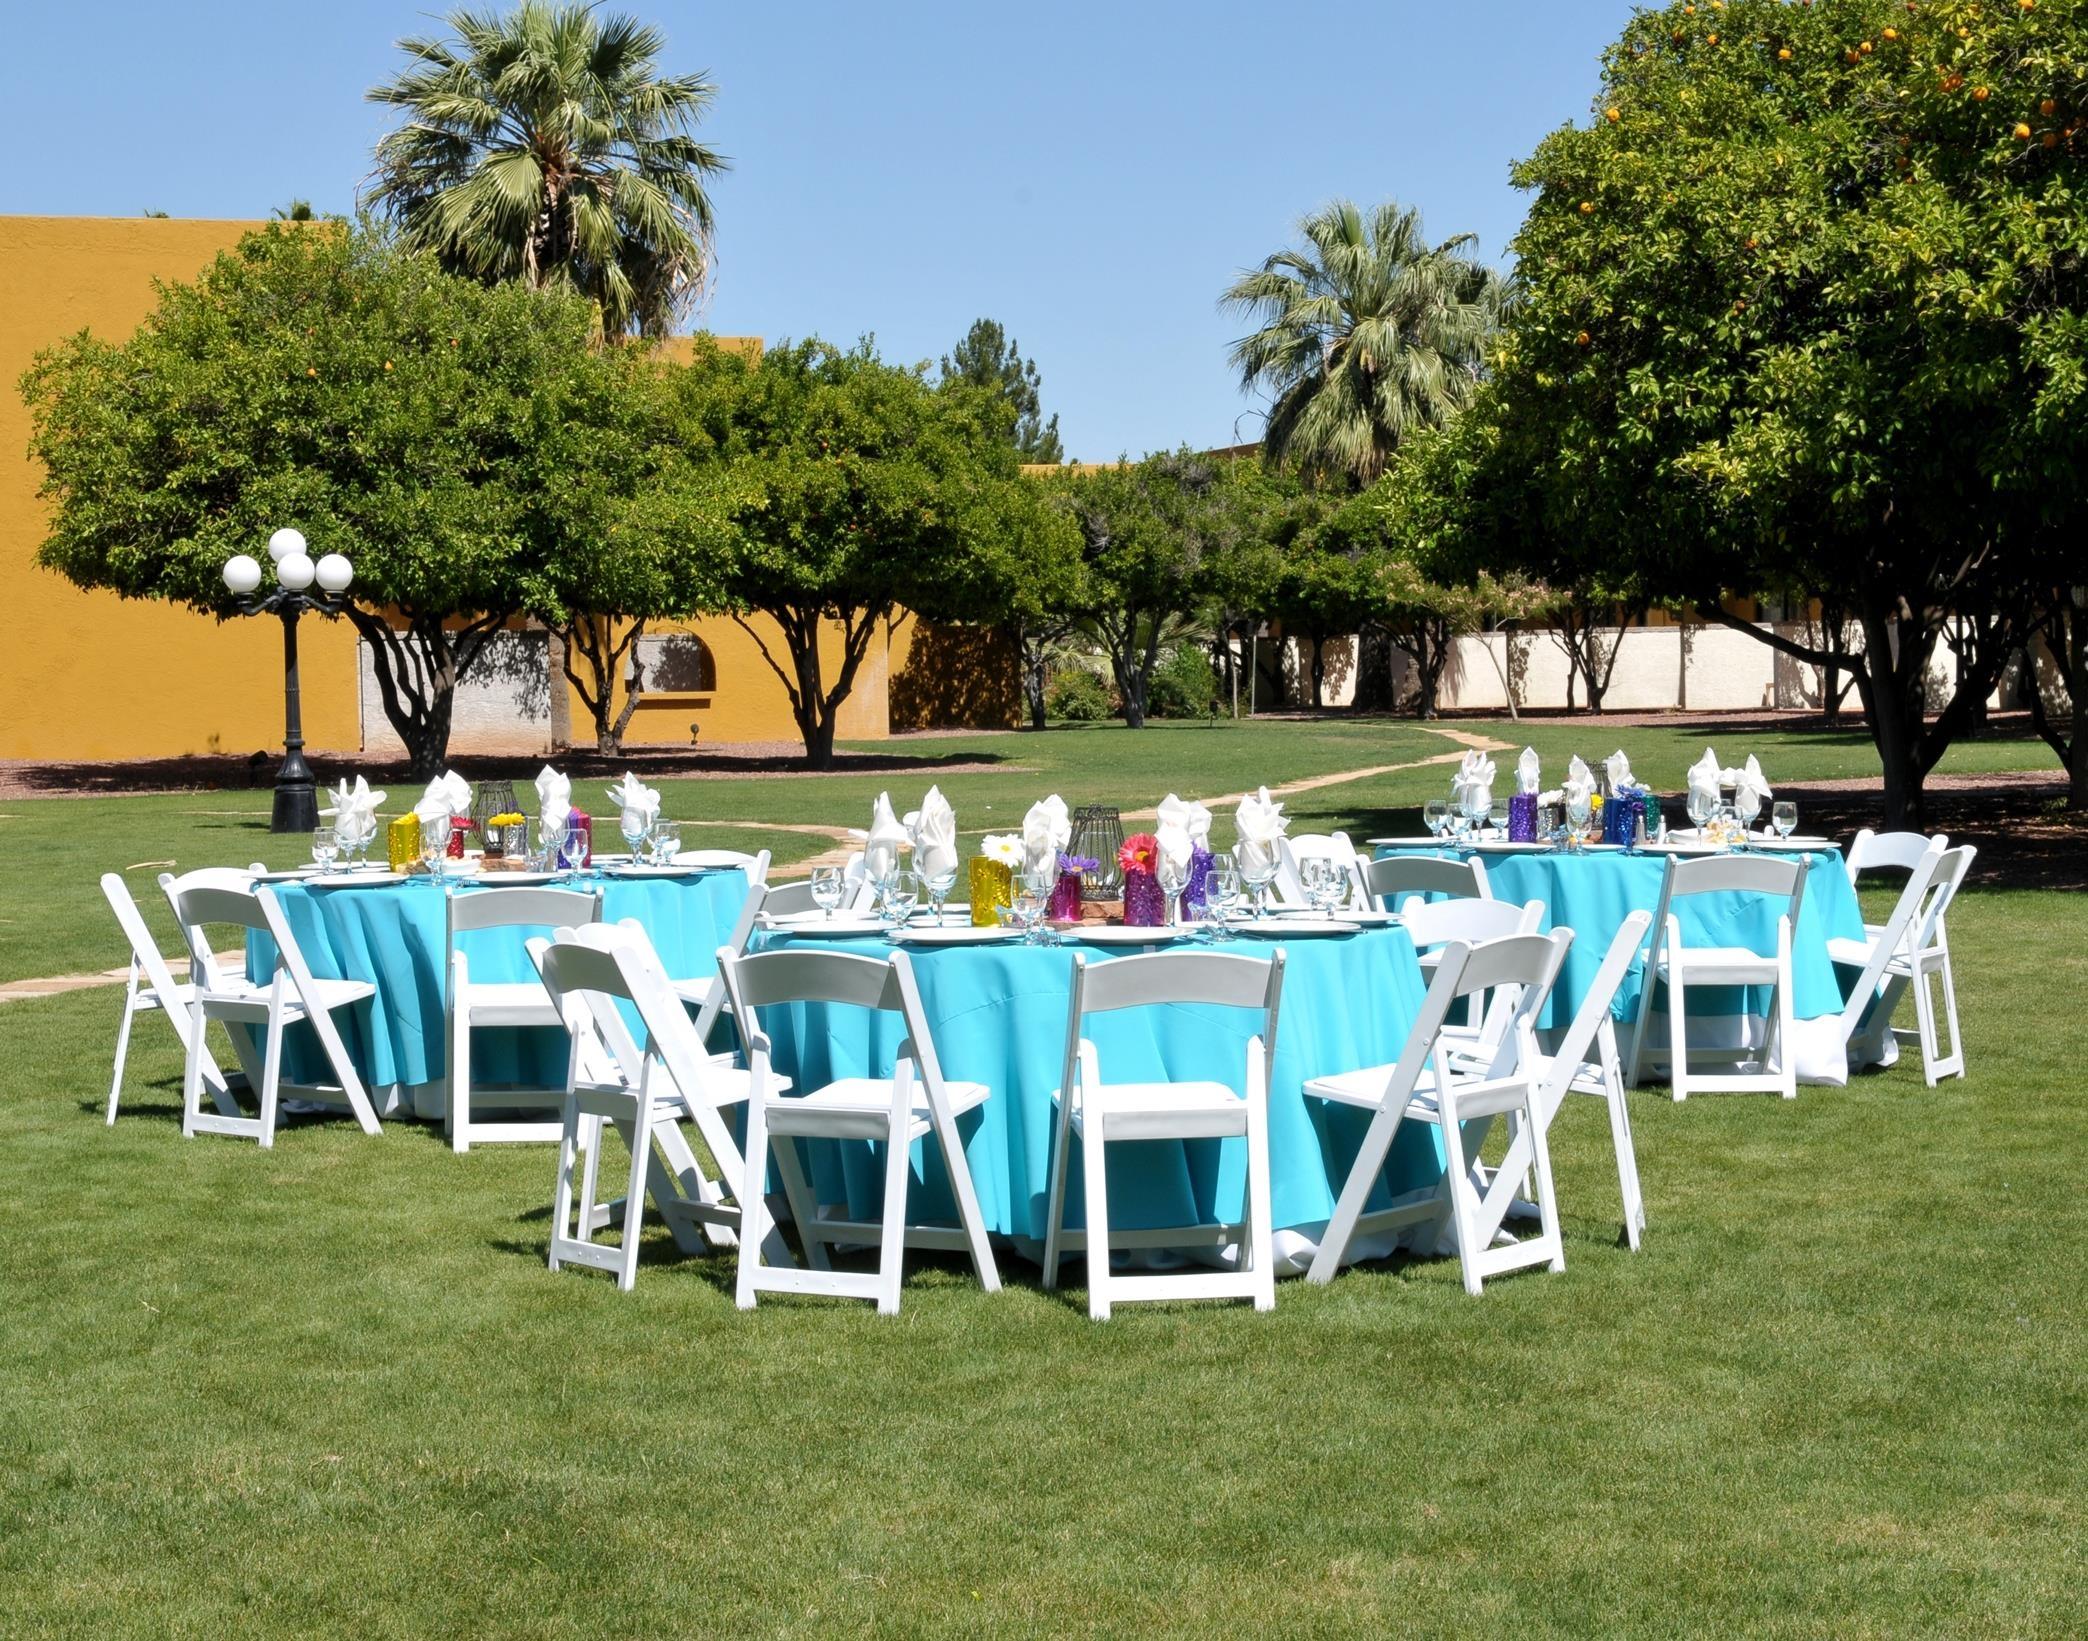 Doubletree Hotel Tucson Reid Park